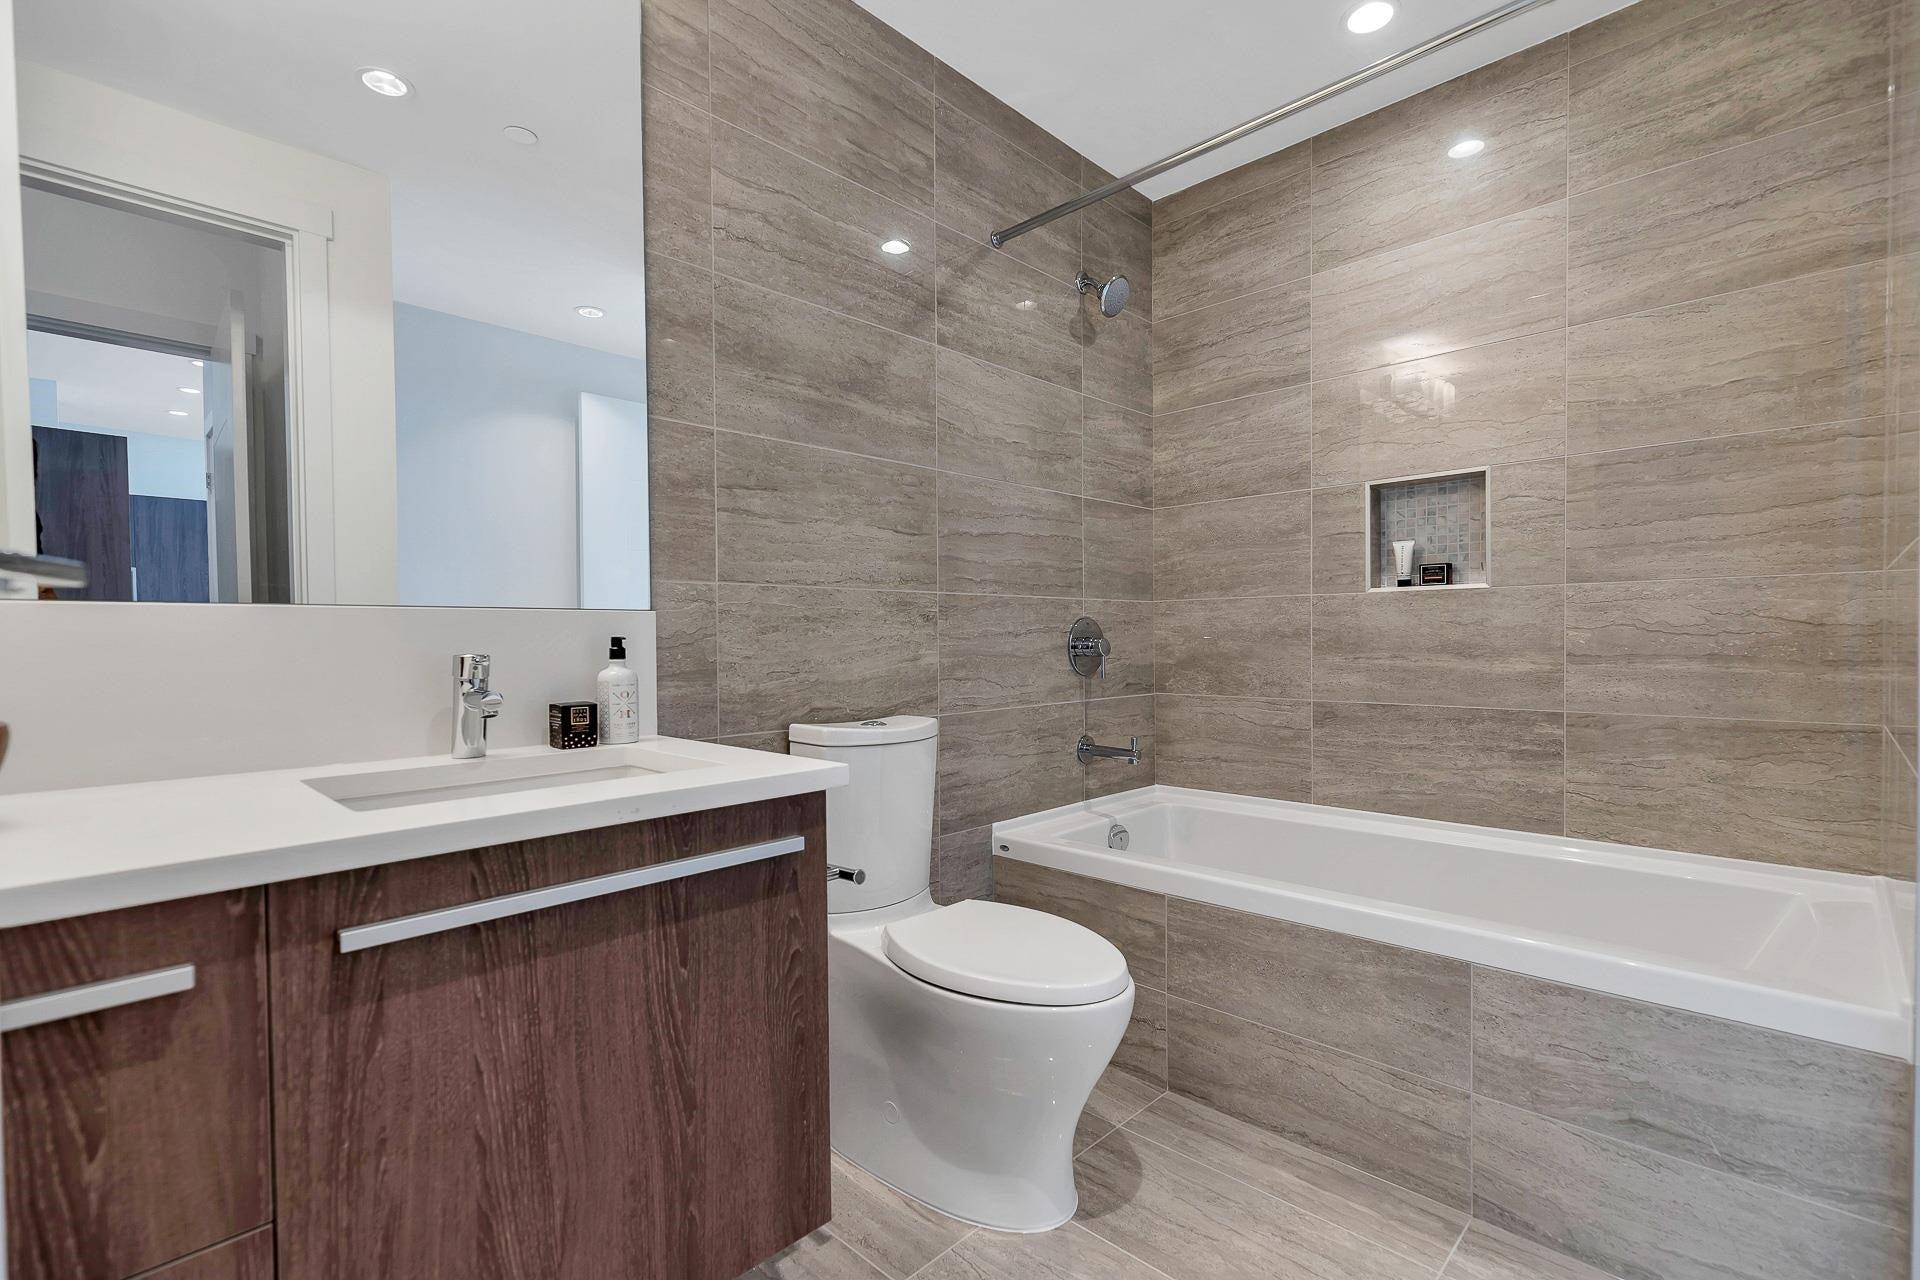 702 2780 VALLEY CENTRE AVENUE - Lynn Valley Apartment/Condo for sale, 3 Bedrooms (R2622279) - #20